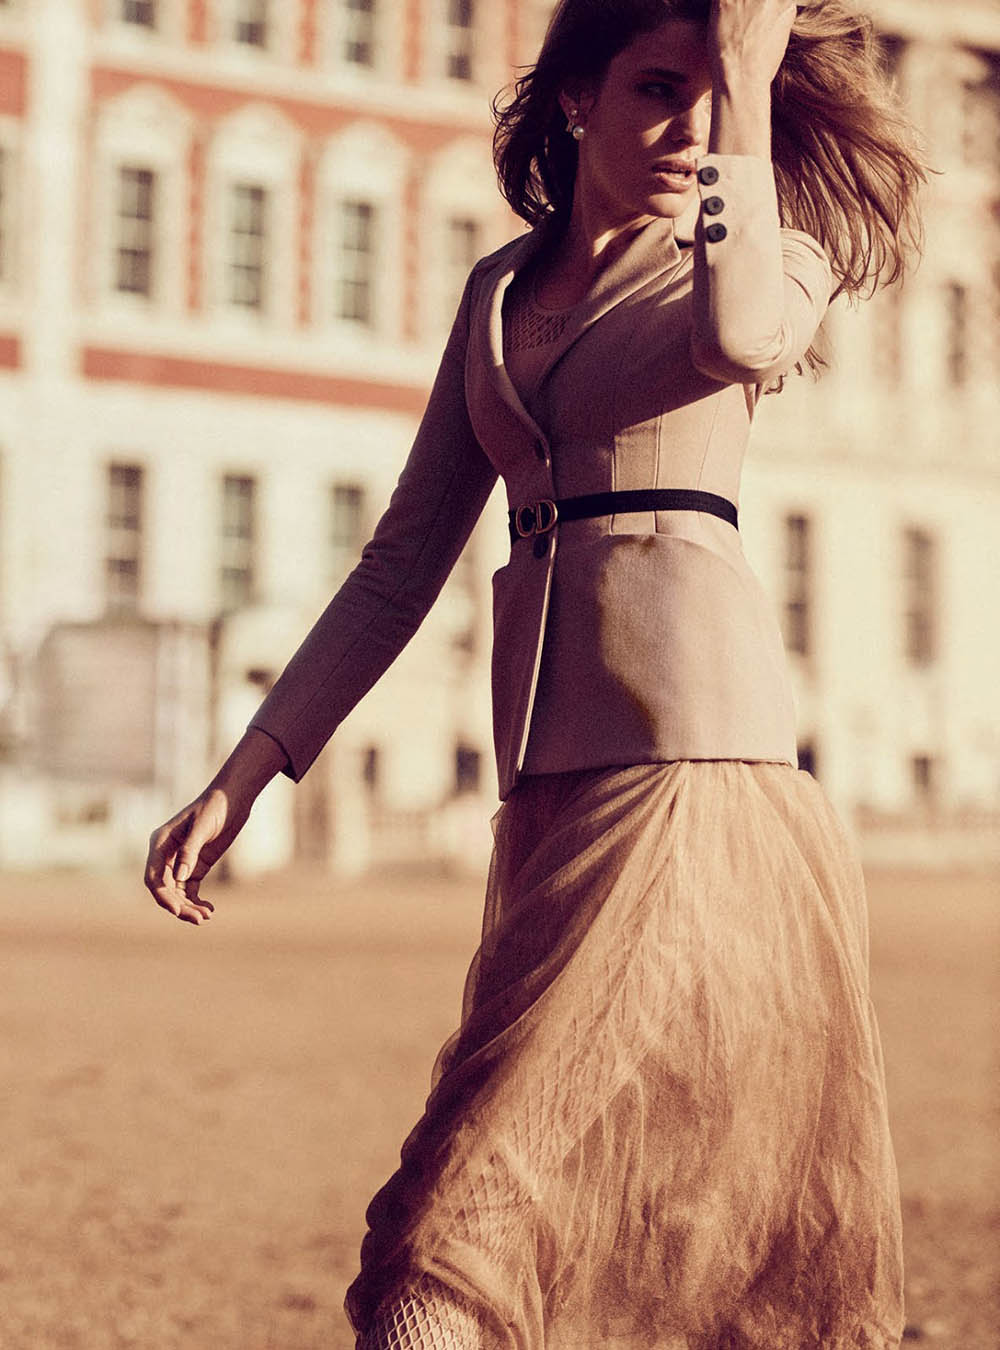 Alisa-Ahmann-by-Regan-Cameron-for-Harper's-Bazaar-UK-March-2019-6.jpg